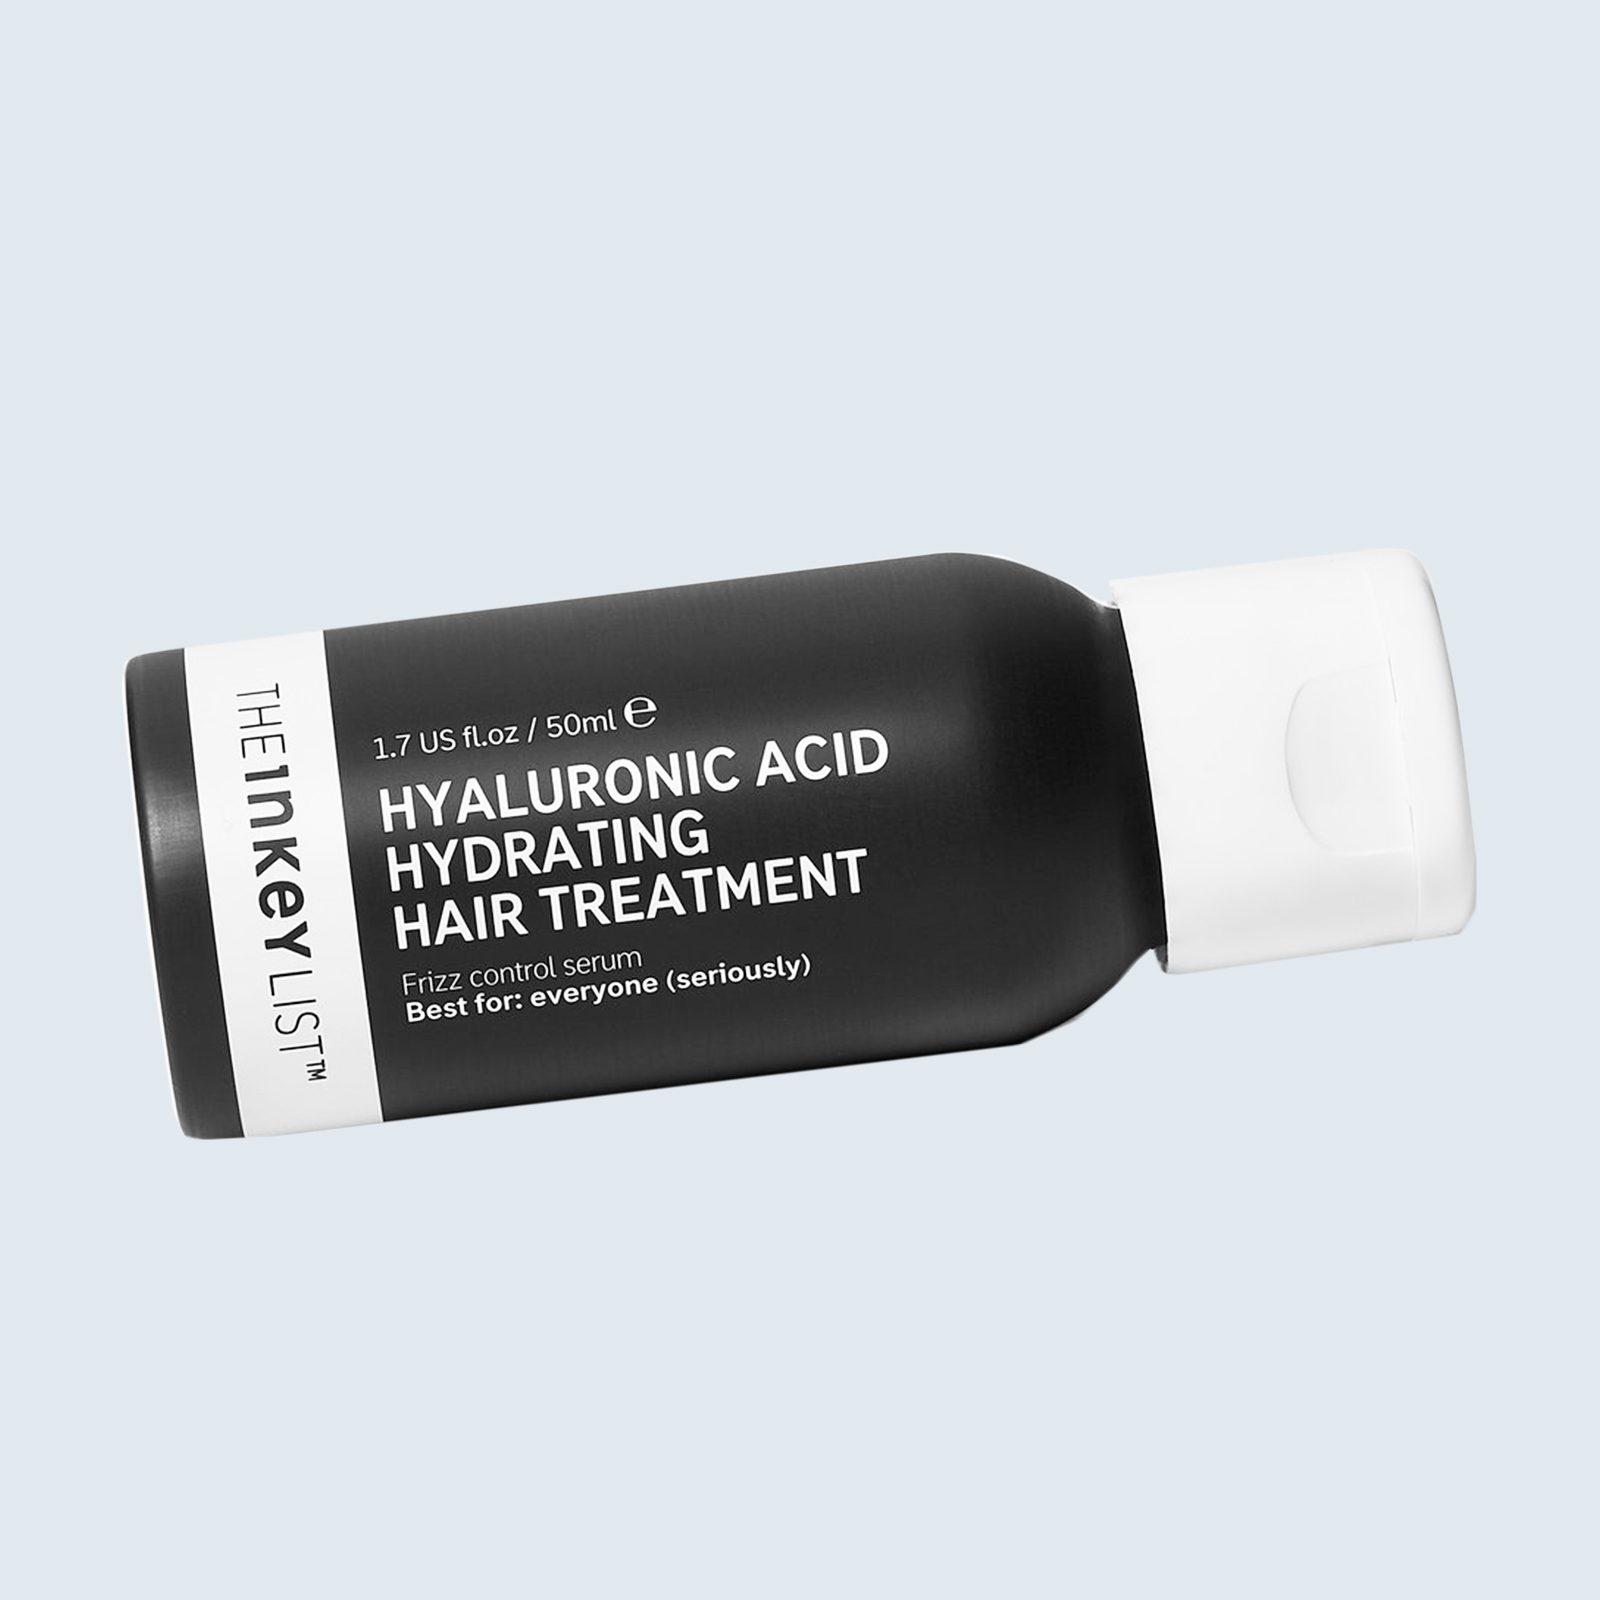 The Inkey List Hyaluronic Acid Hydrating Hair Treatment